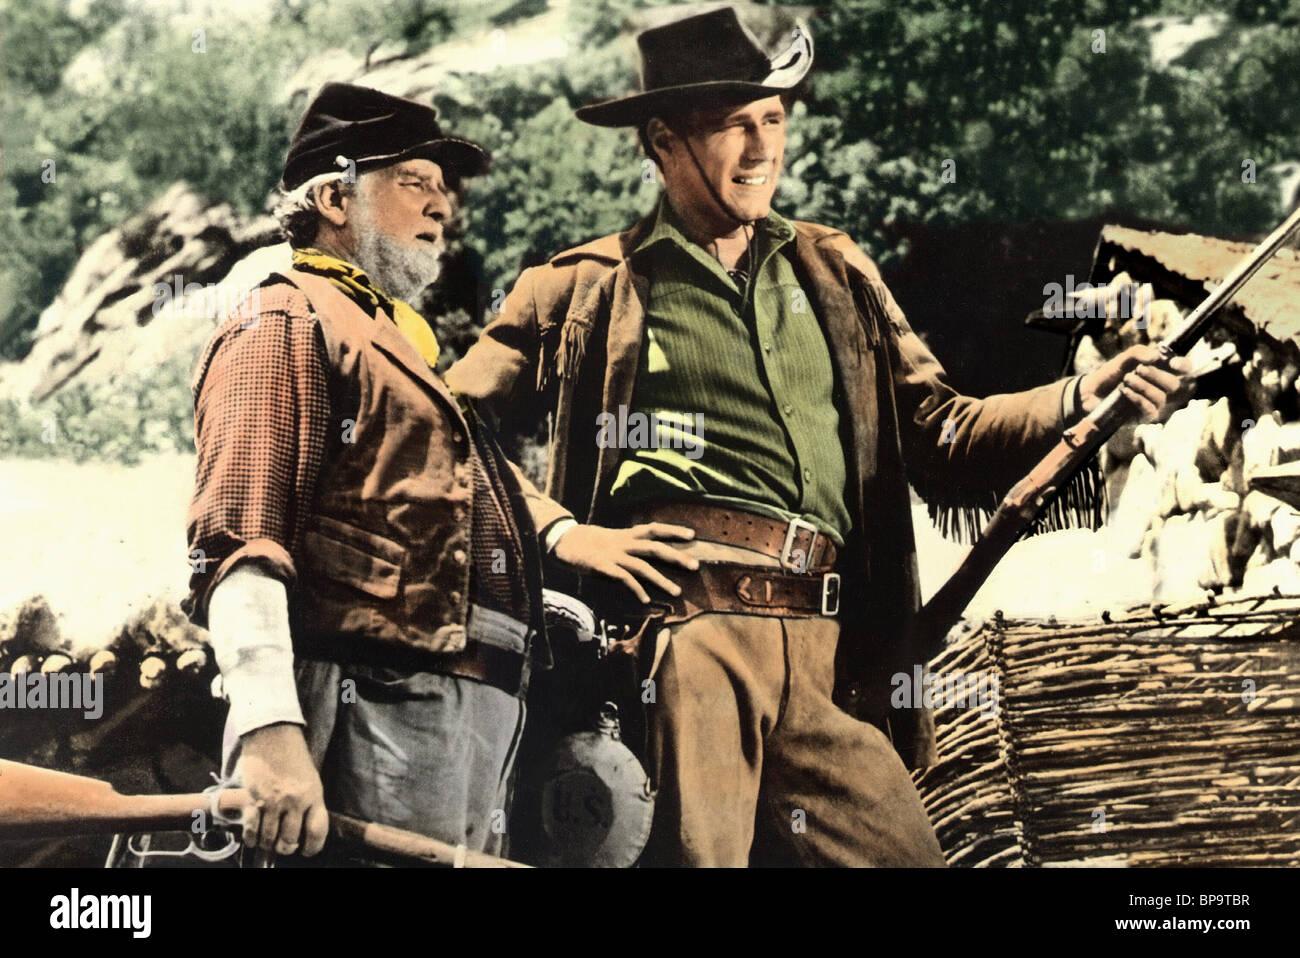 Wallace ford phil carey the nebraskan 1953 stock image